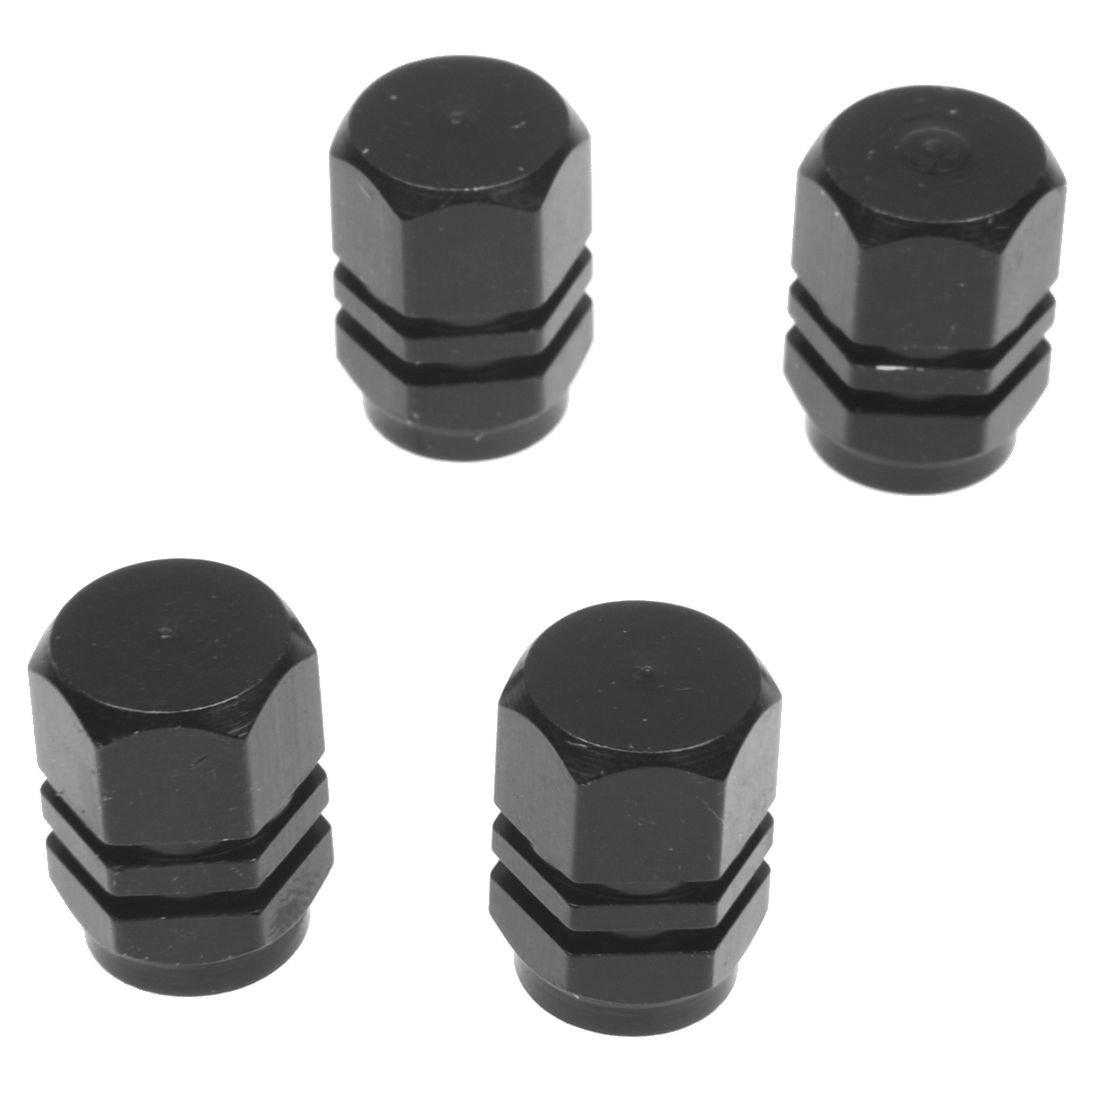 R motorcycle Set of 4 Alu valve caps for tires of bicycle Valve cap Black TOOGOO car